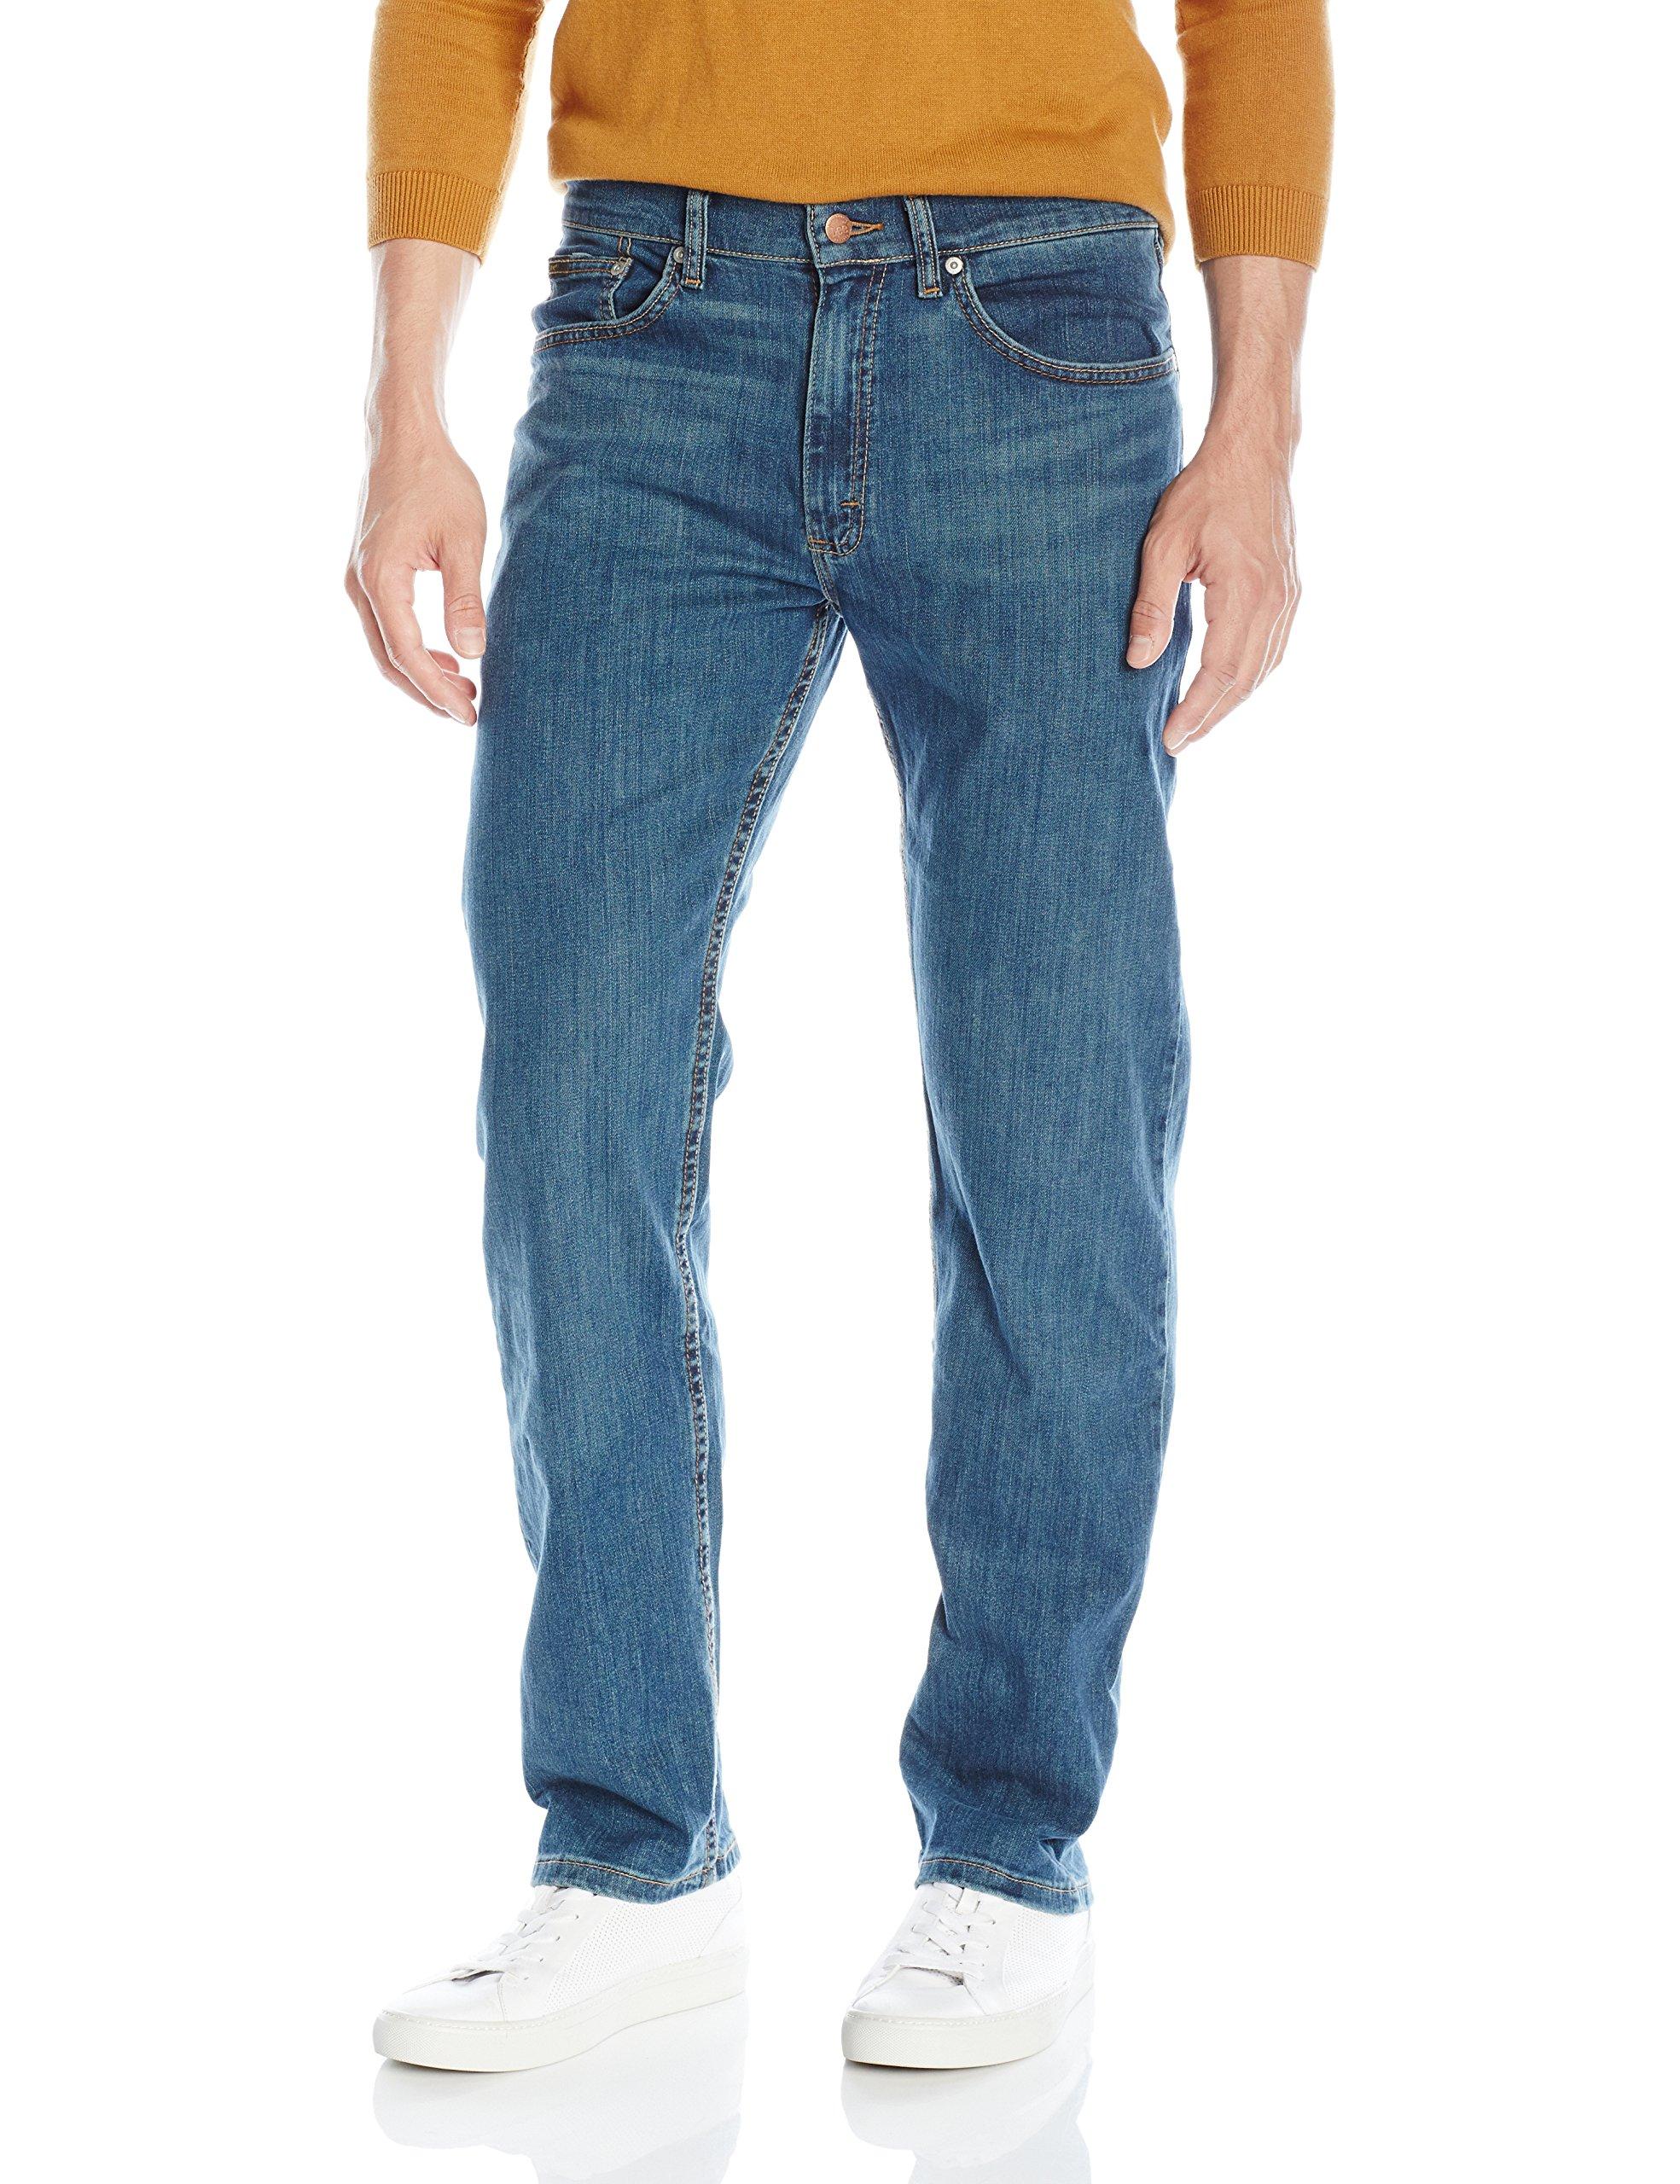 LEE Men's Premium Select Regular-Fit Straight-Leg Jean, Chopper, 38W x 32L